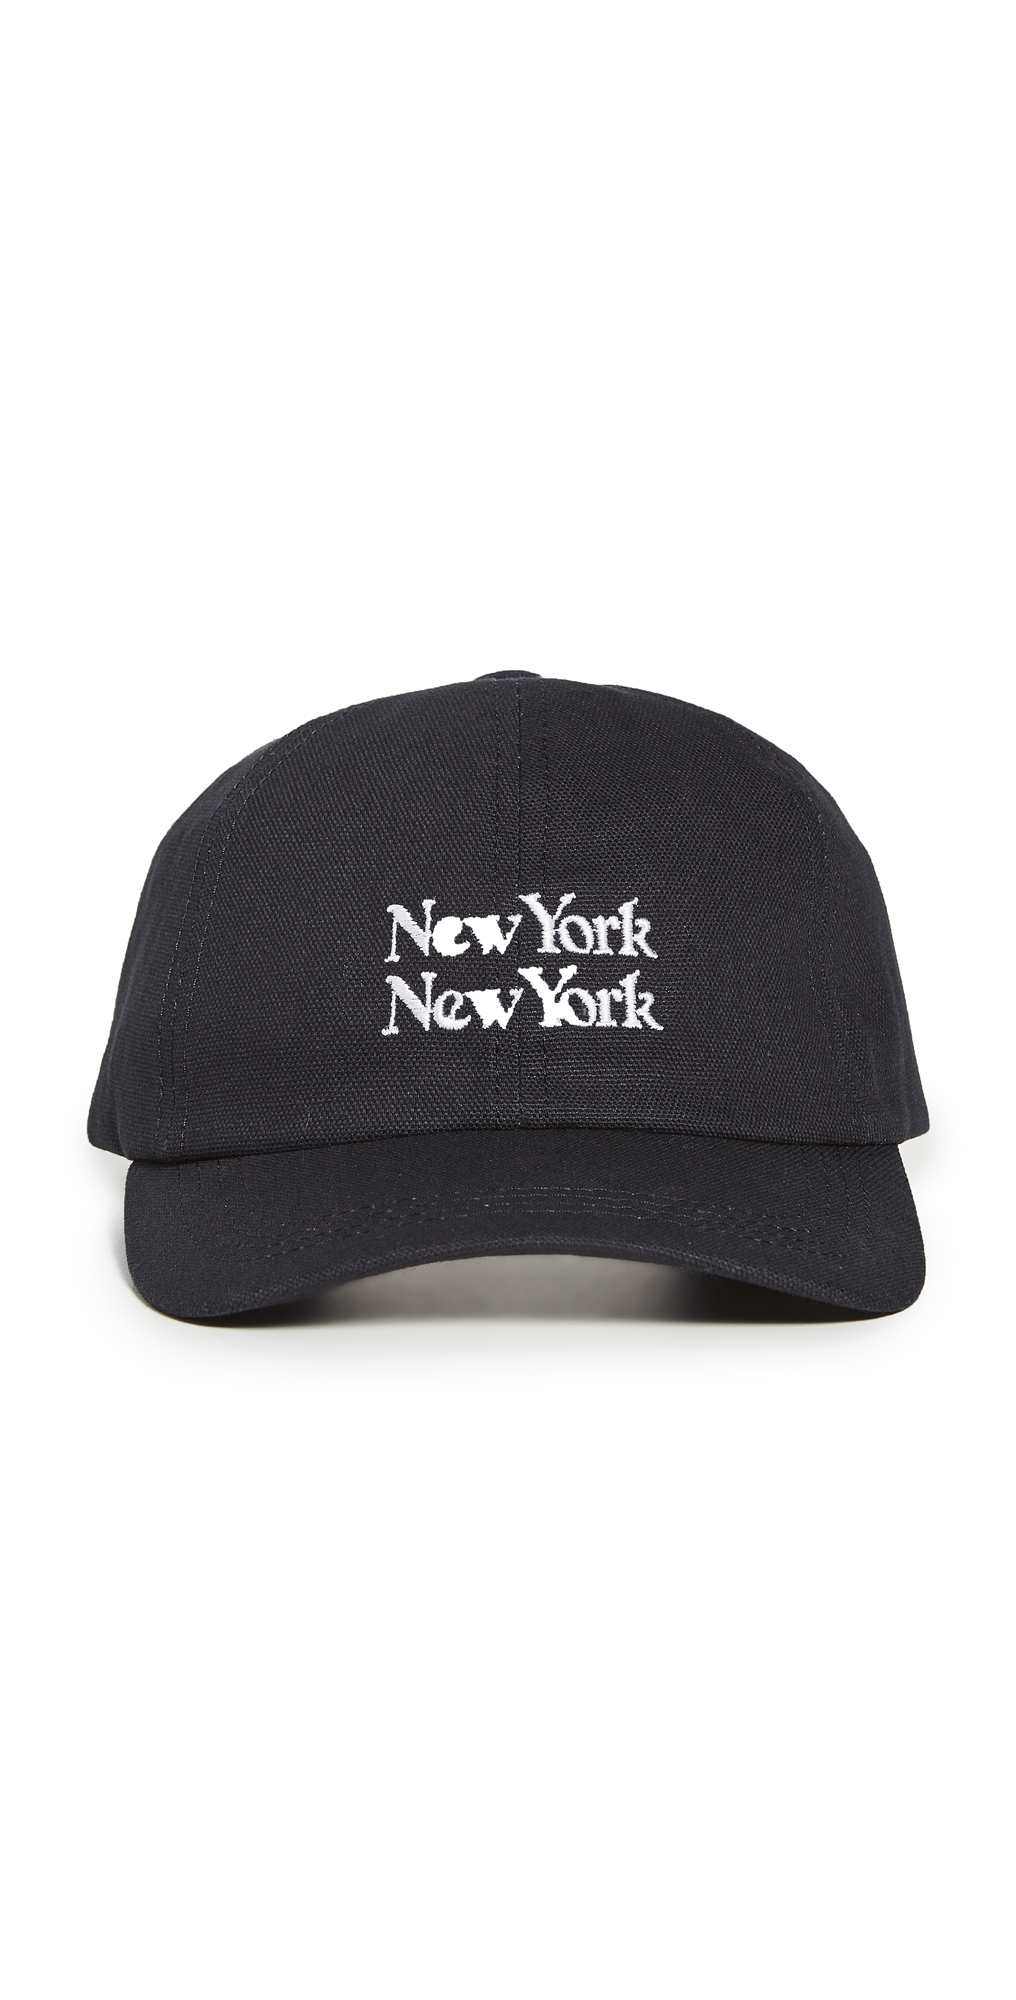 New York New York Cap